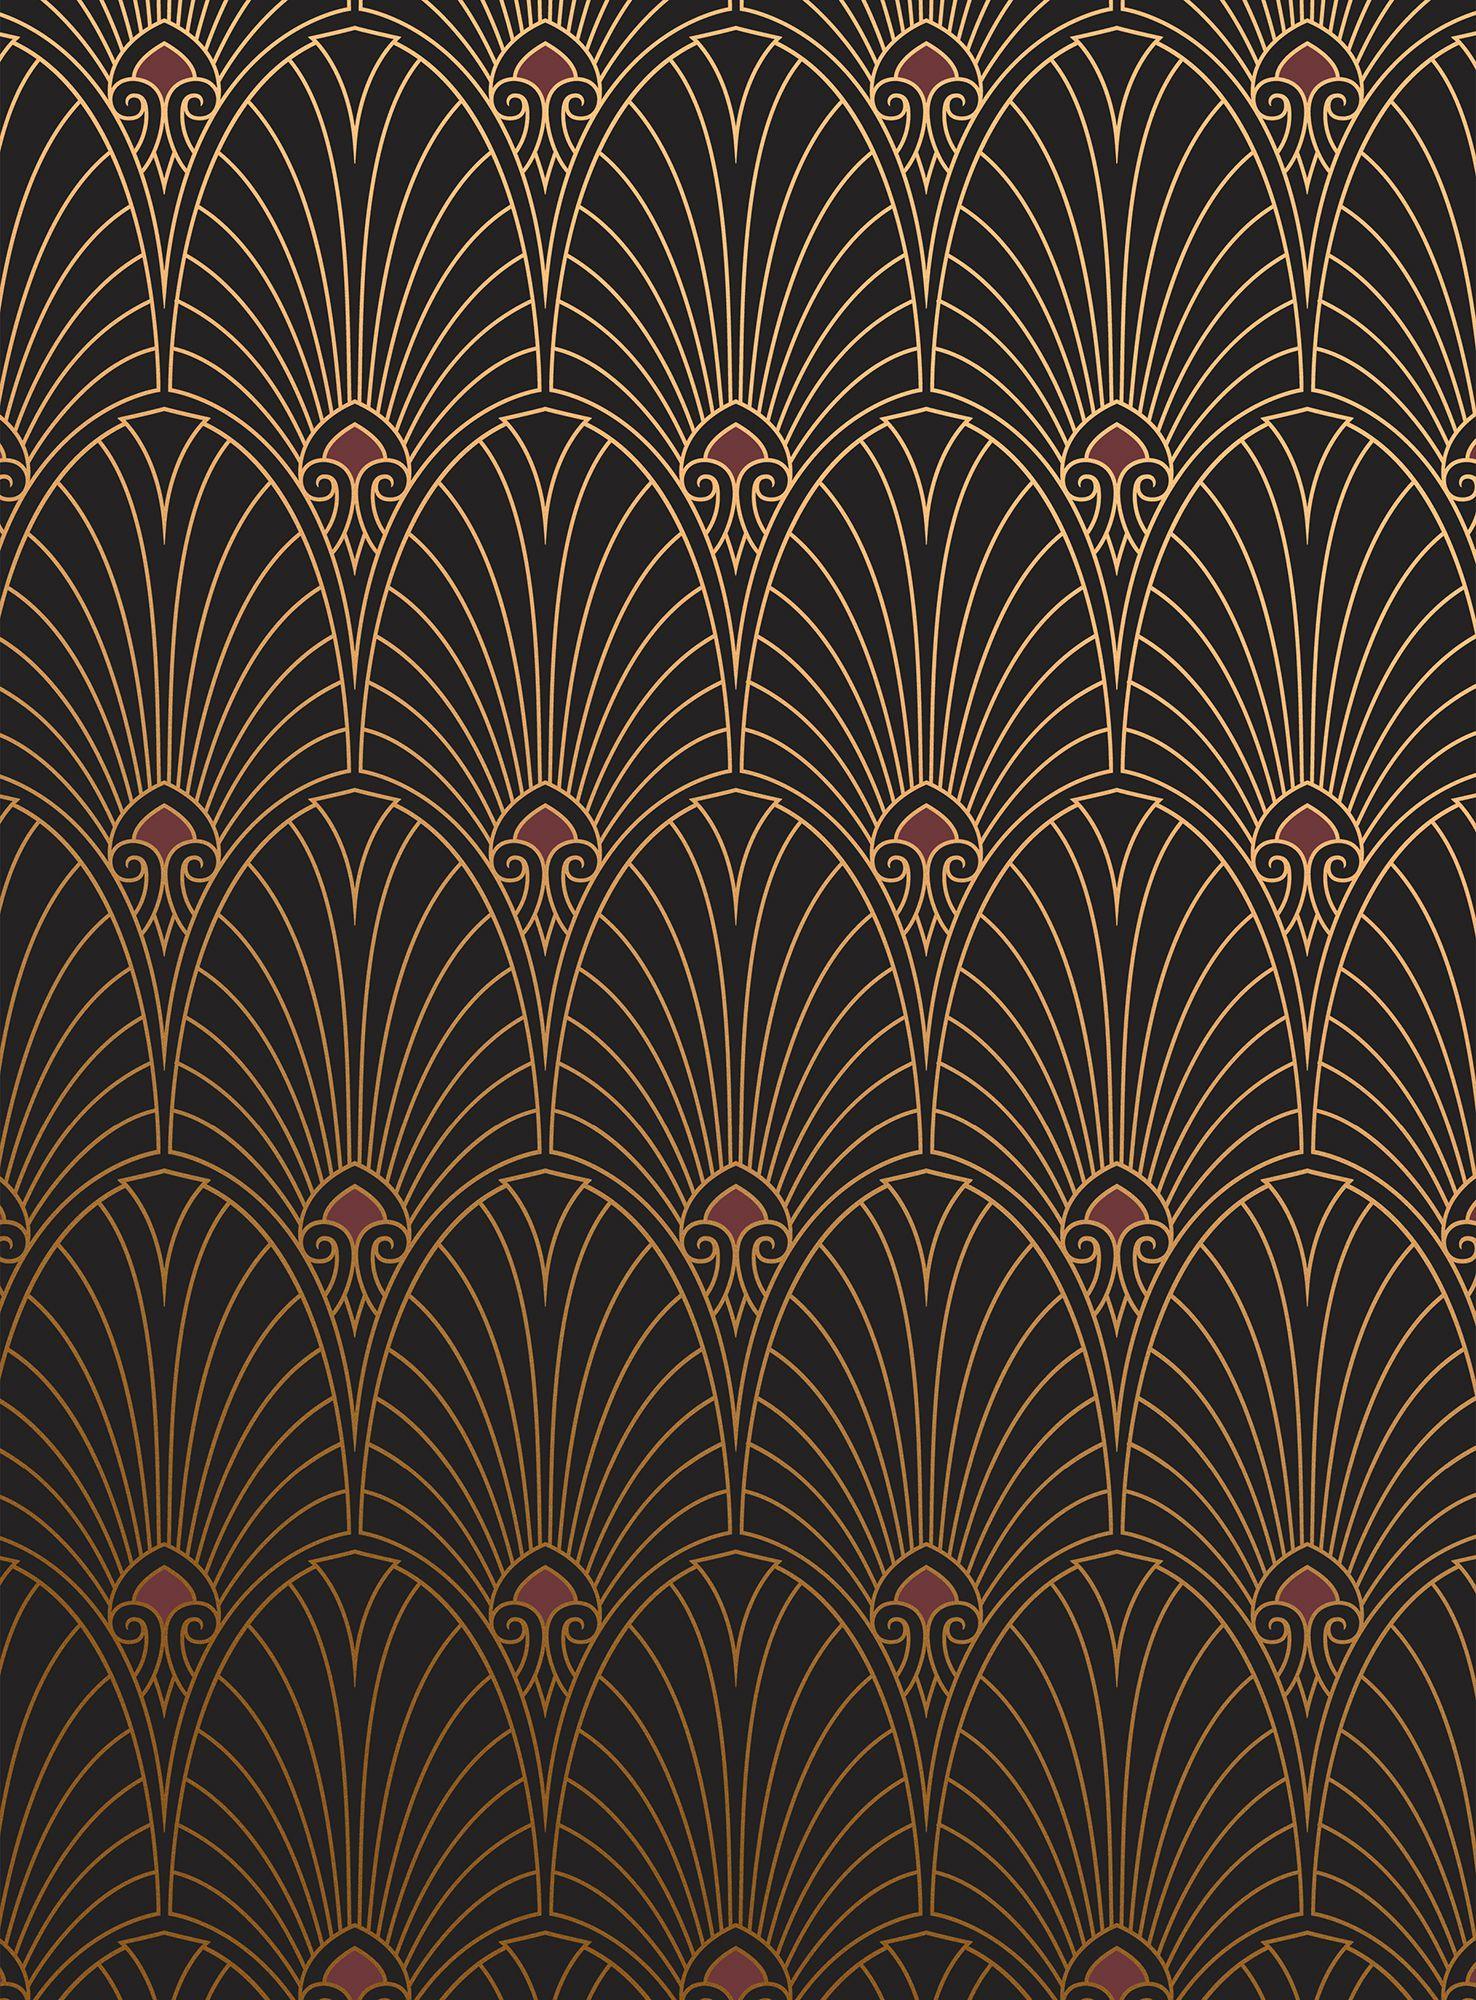 18 Art Deco Wallpaper Ideas , Decorating with 1920s Art Deco